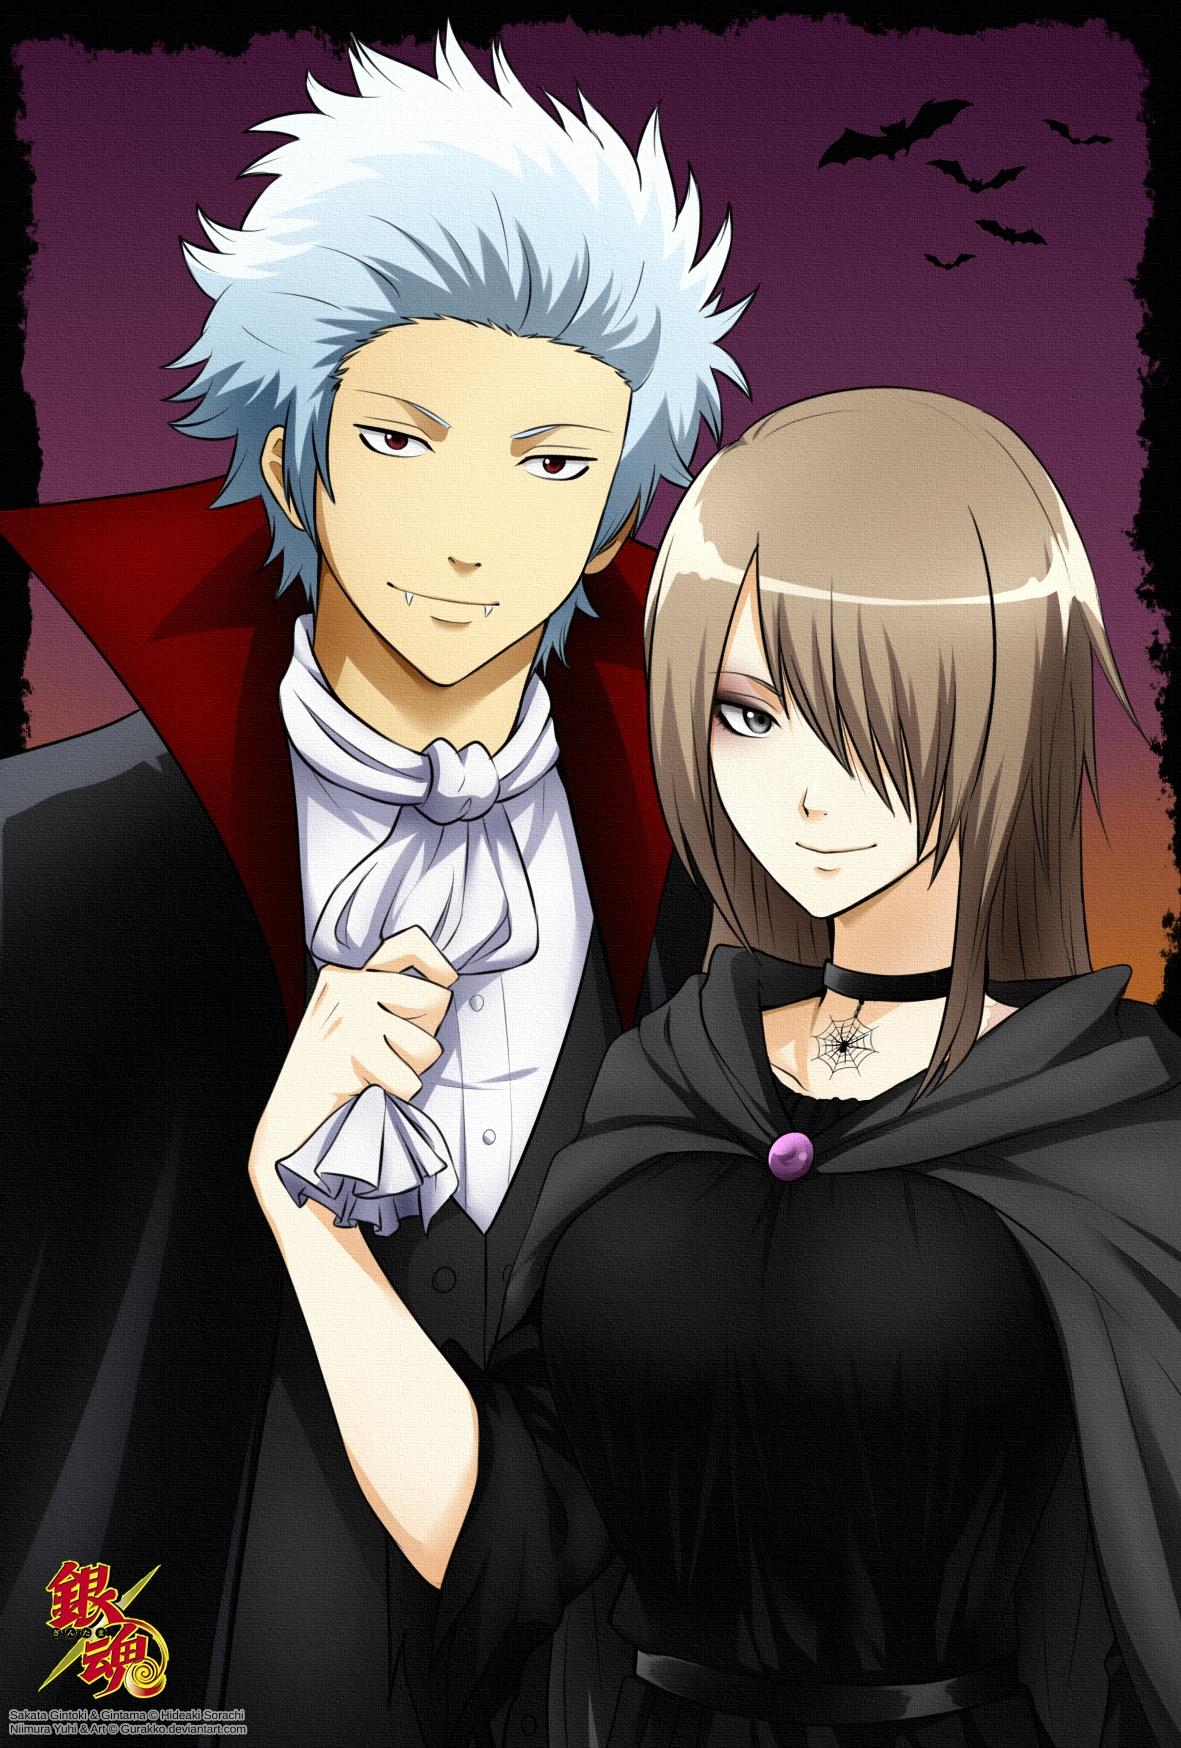 Anime Characters For Halloween : Gintama silver soul image zerochan anime